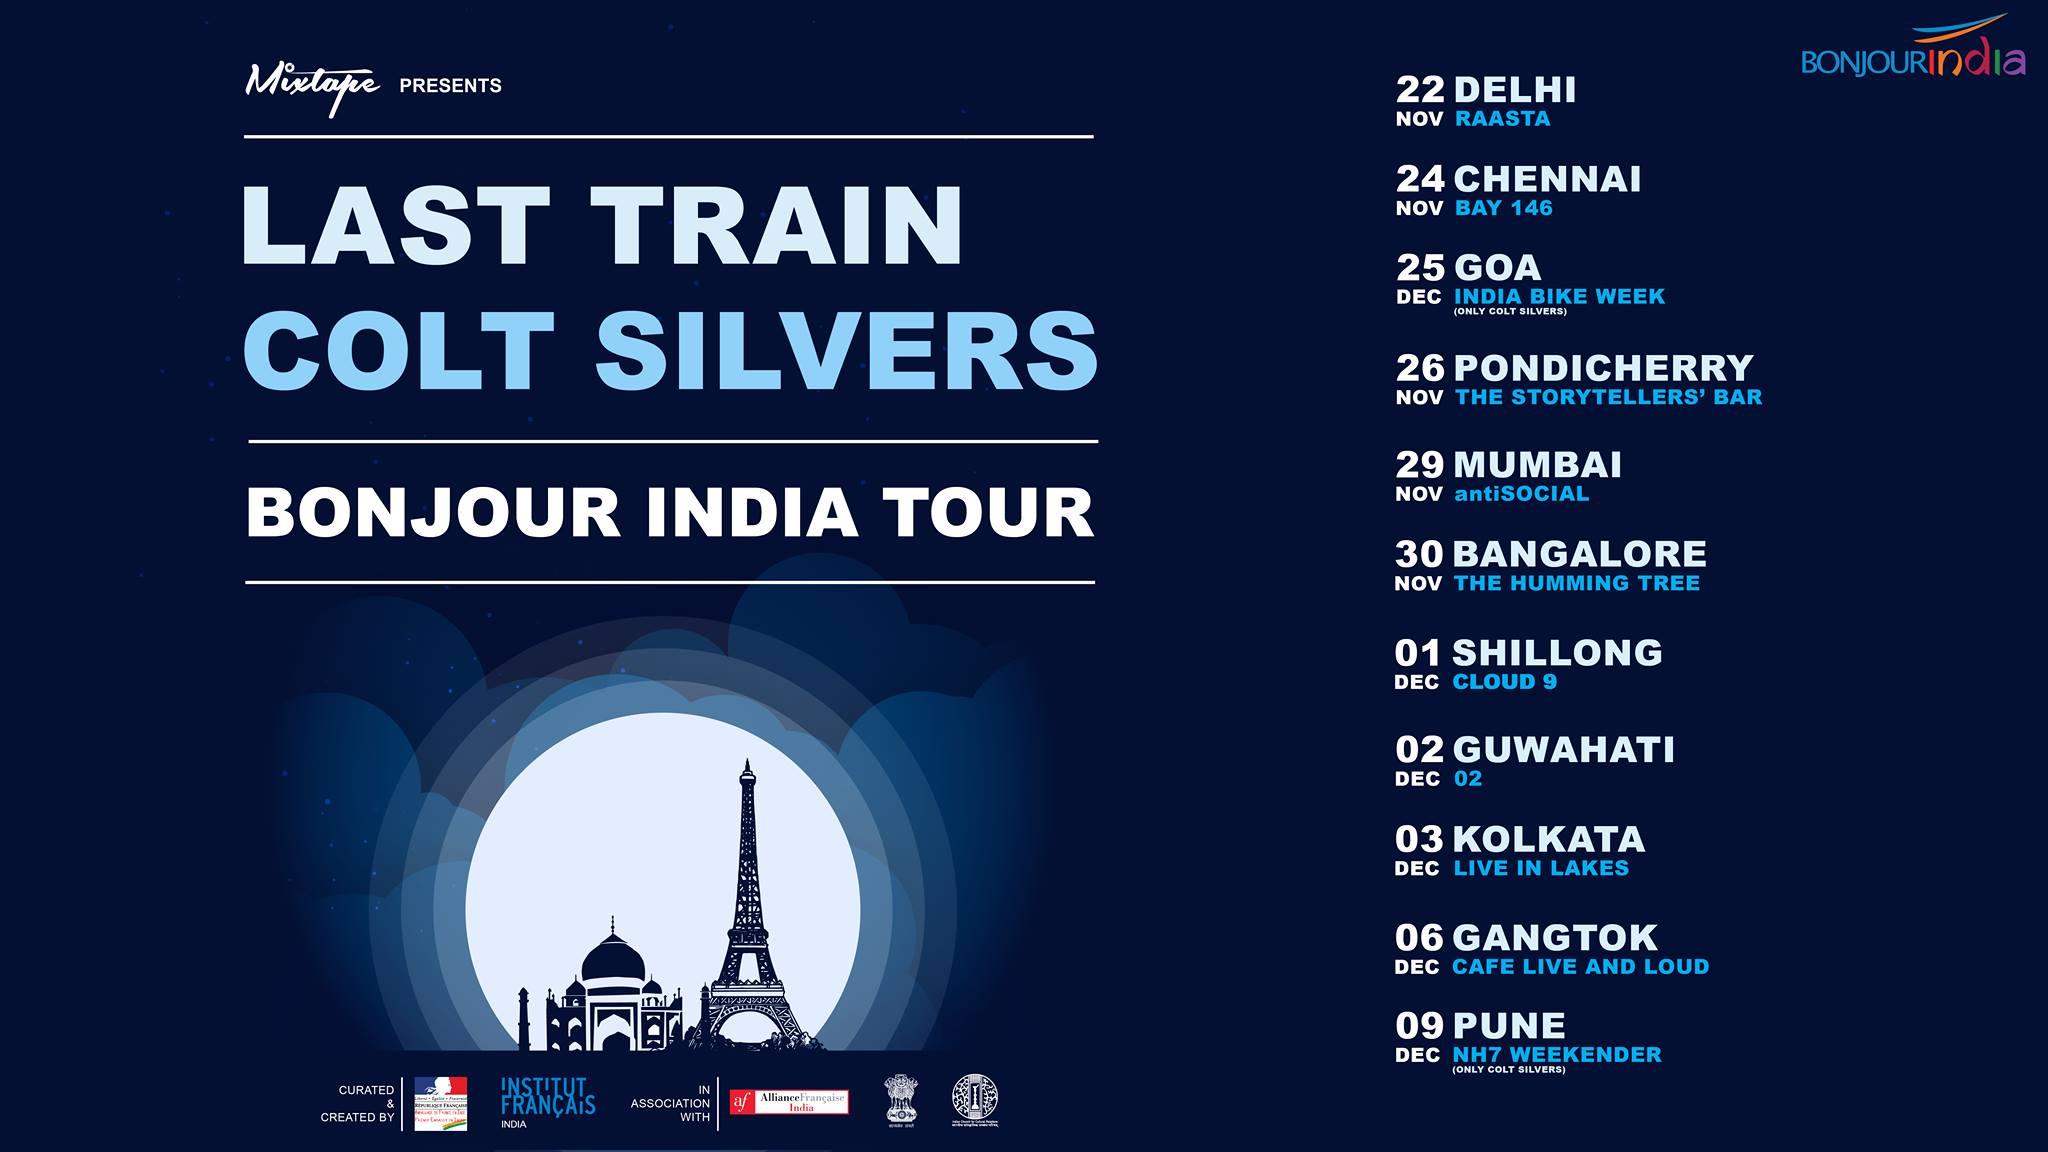 Last Train + Colt Silvers